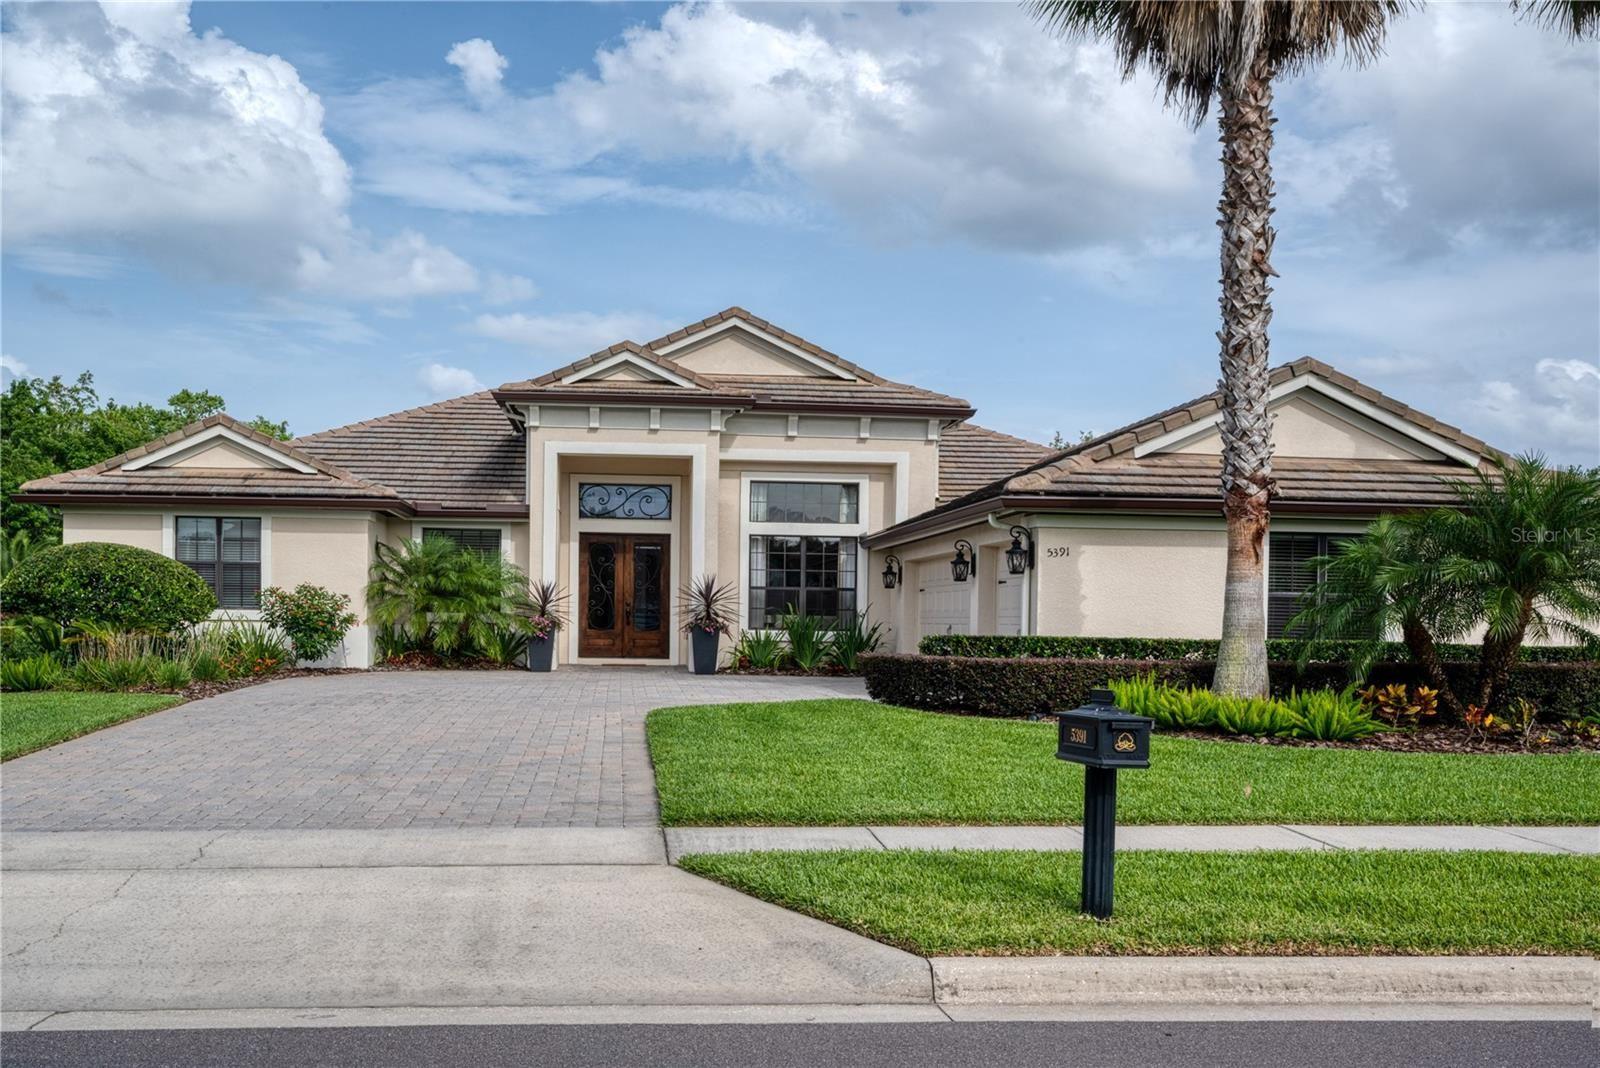 5391 GLENLAKE PLACE, Sanford, FL 32771 - #: O5953859